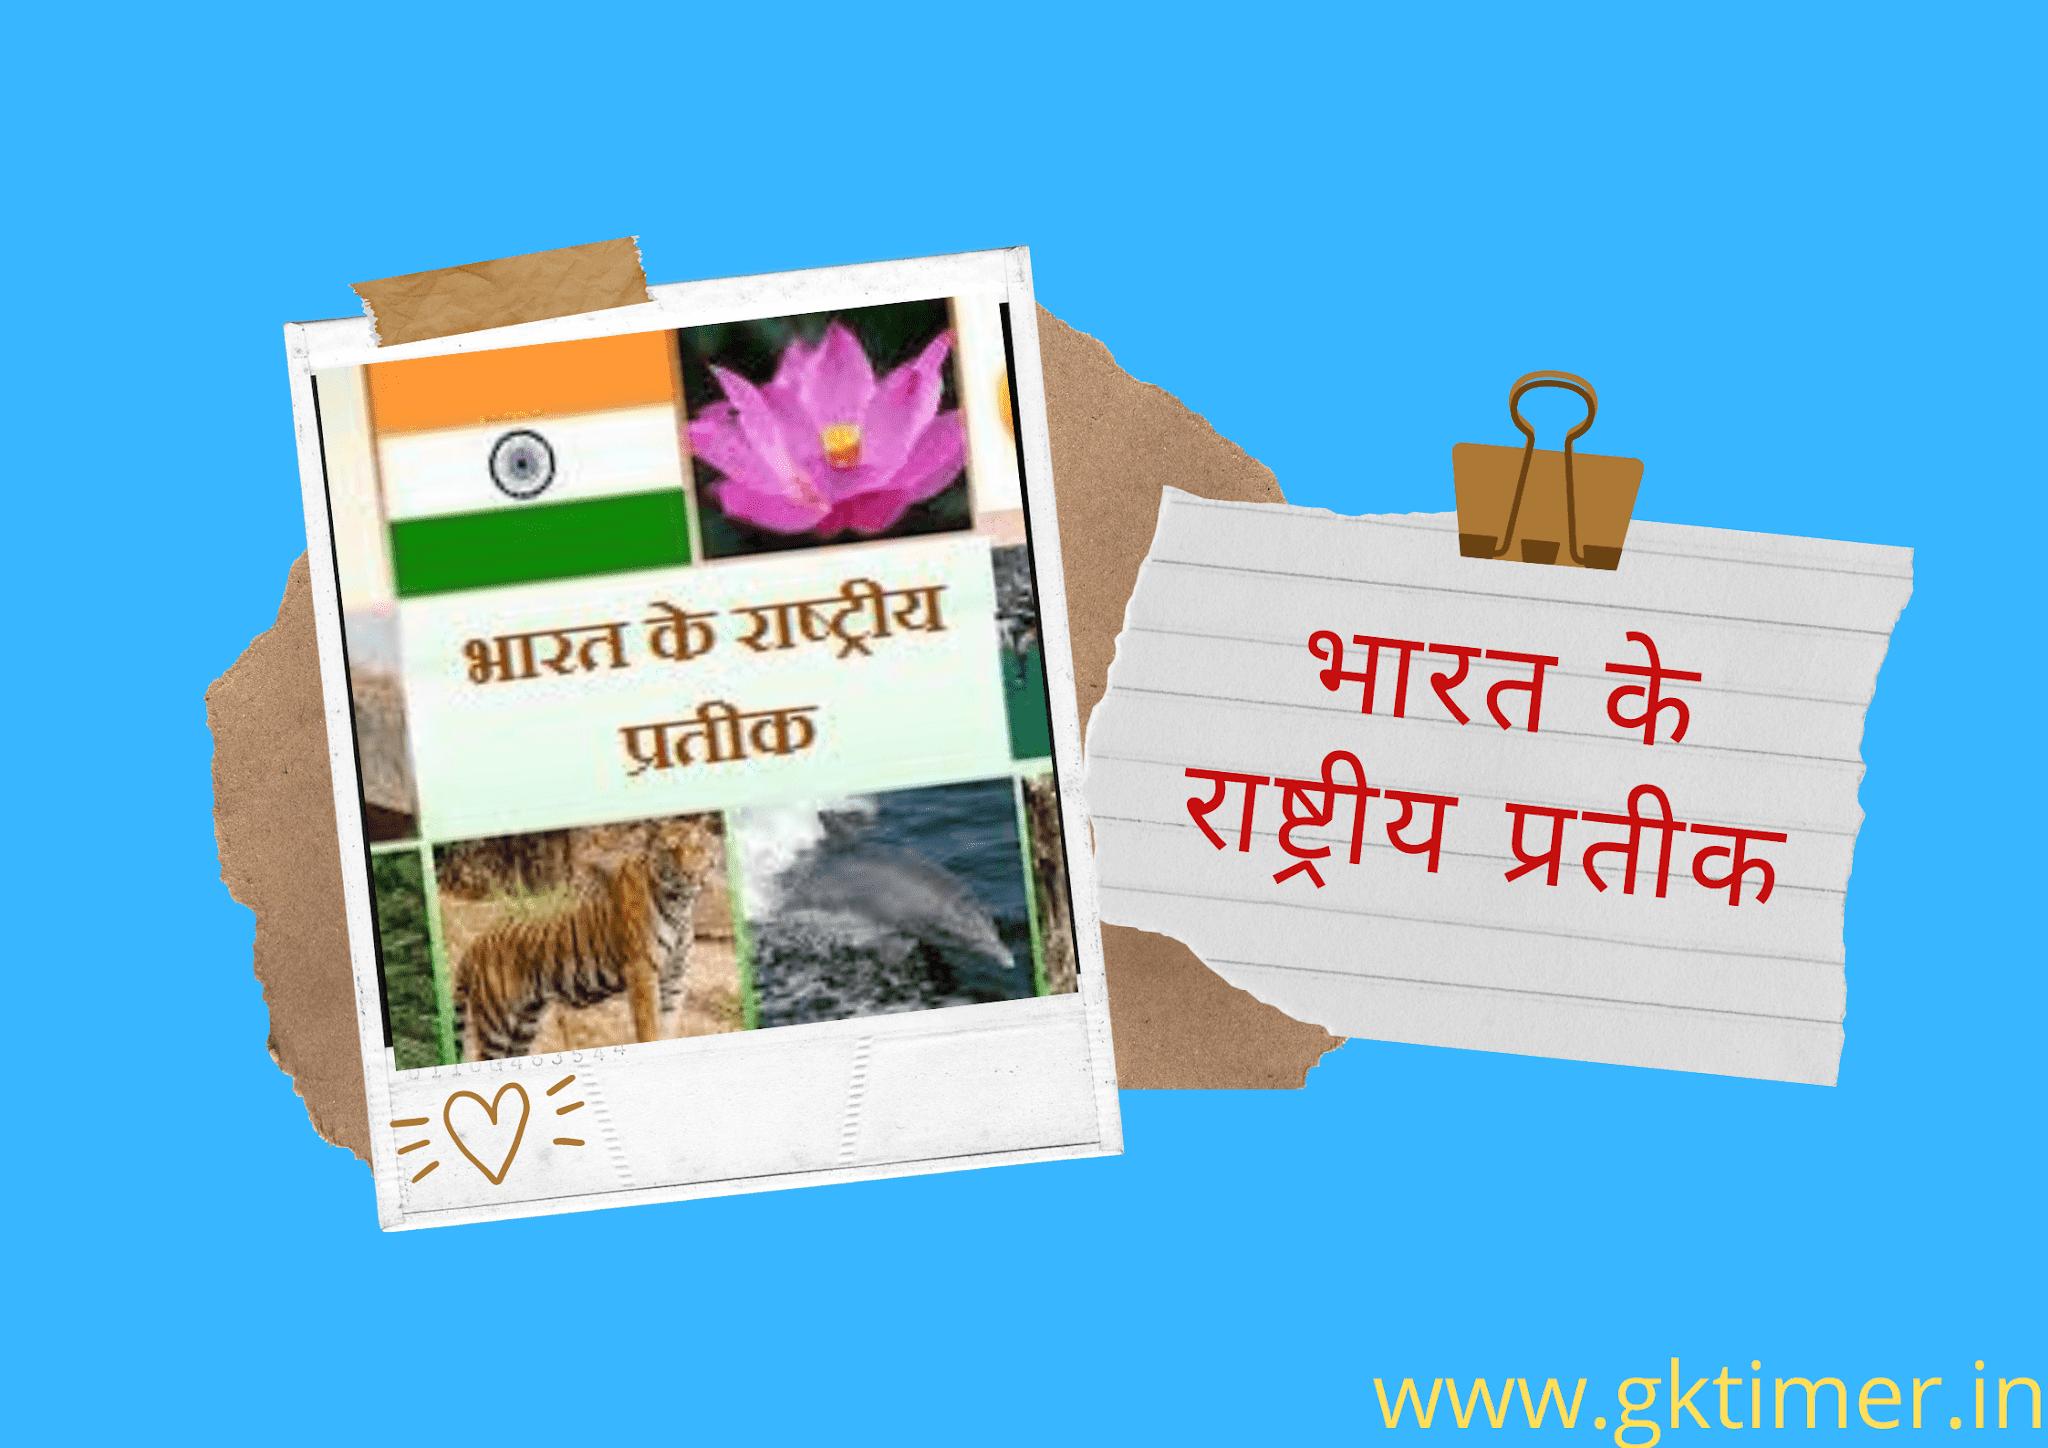 भारत के राष्ट्रीय प्रतीक | National Symbols of India in Hindi